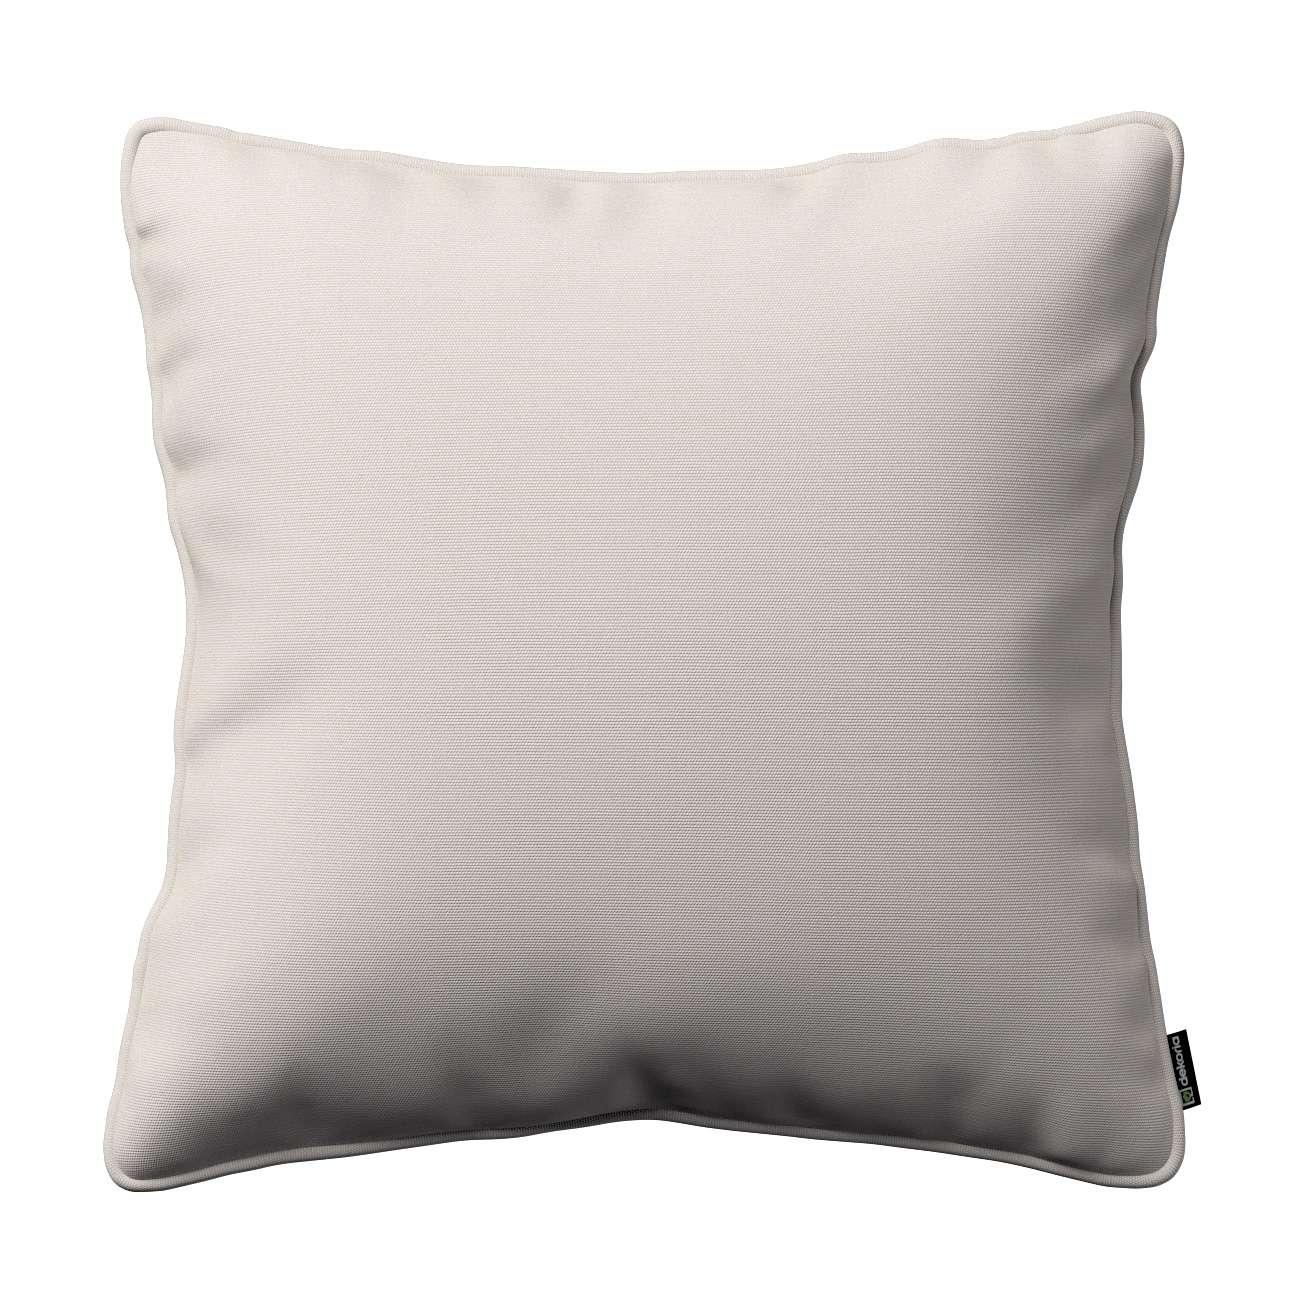 Kissenhülle Gabi mit Paspel 45 x 45 cm von der Kollektion Cotton Panama, Stoff: 702-31